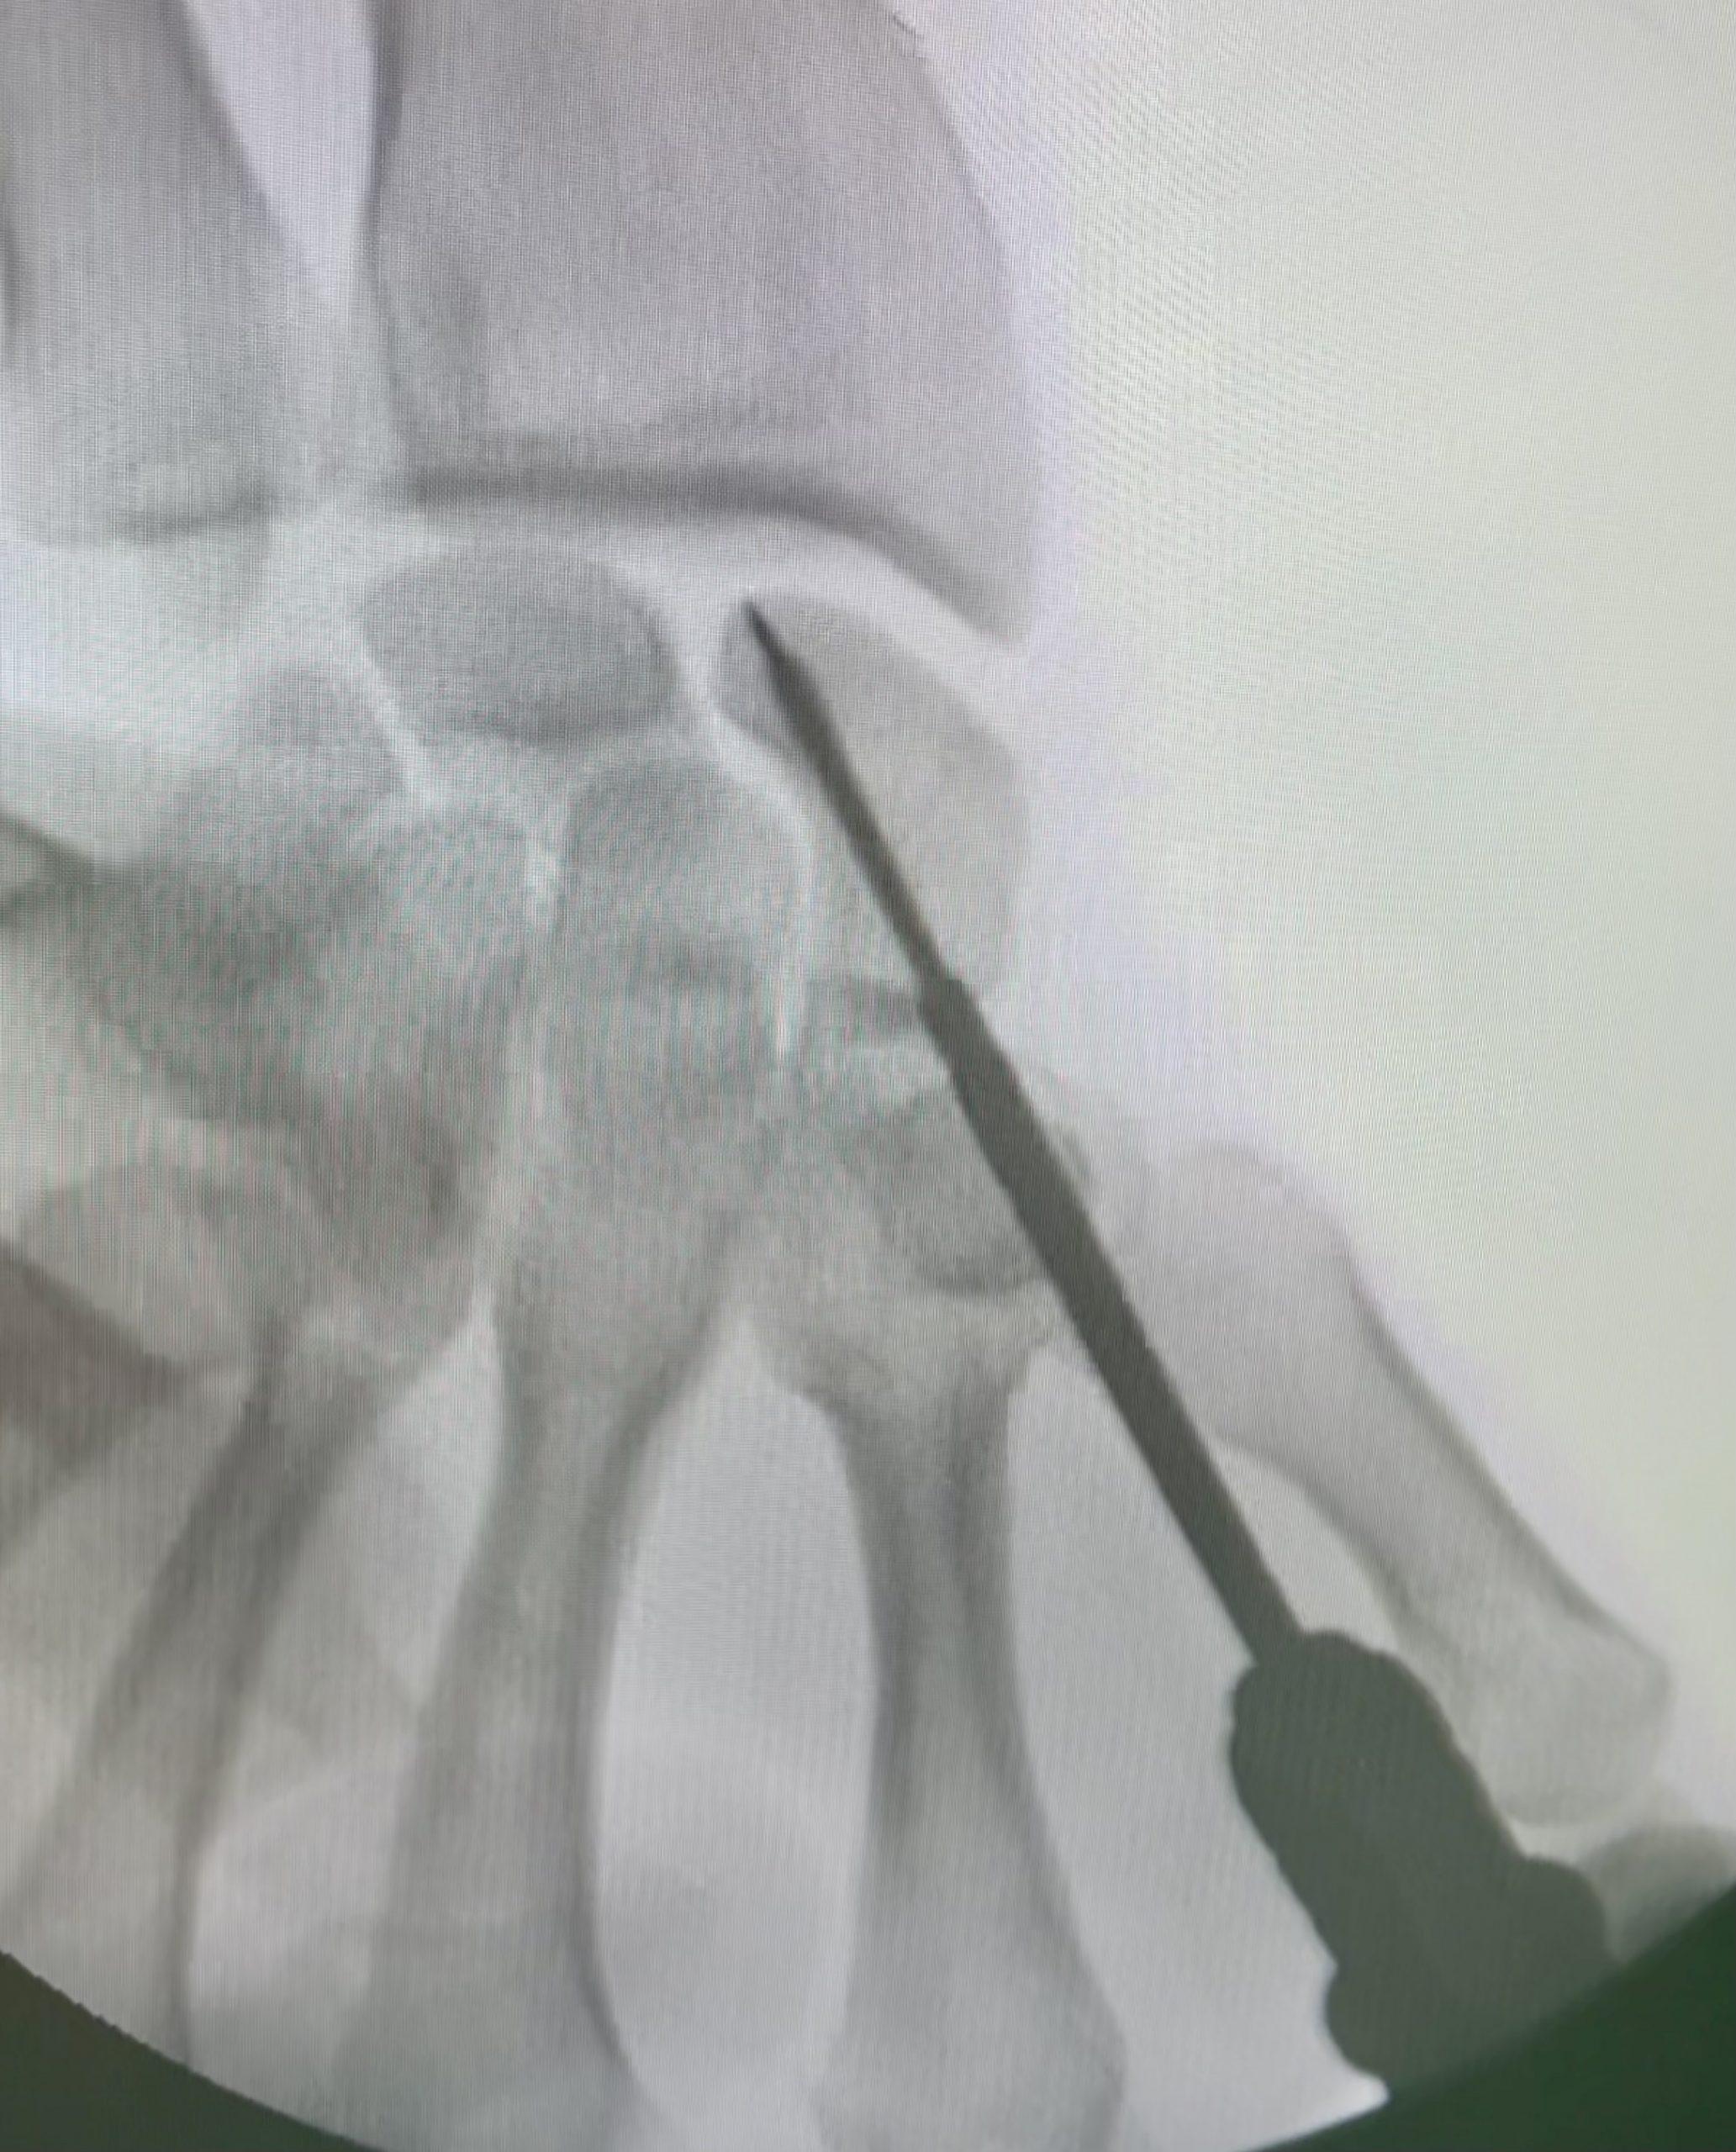 Prelomi skafoidne kosti